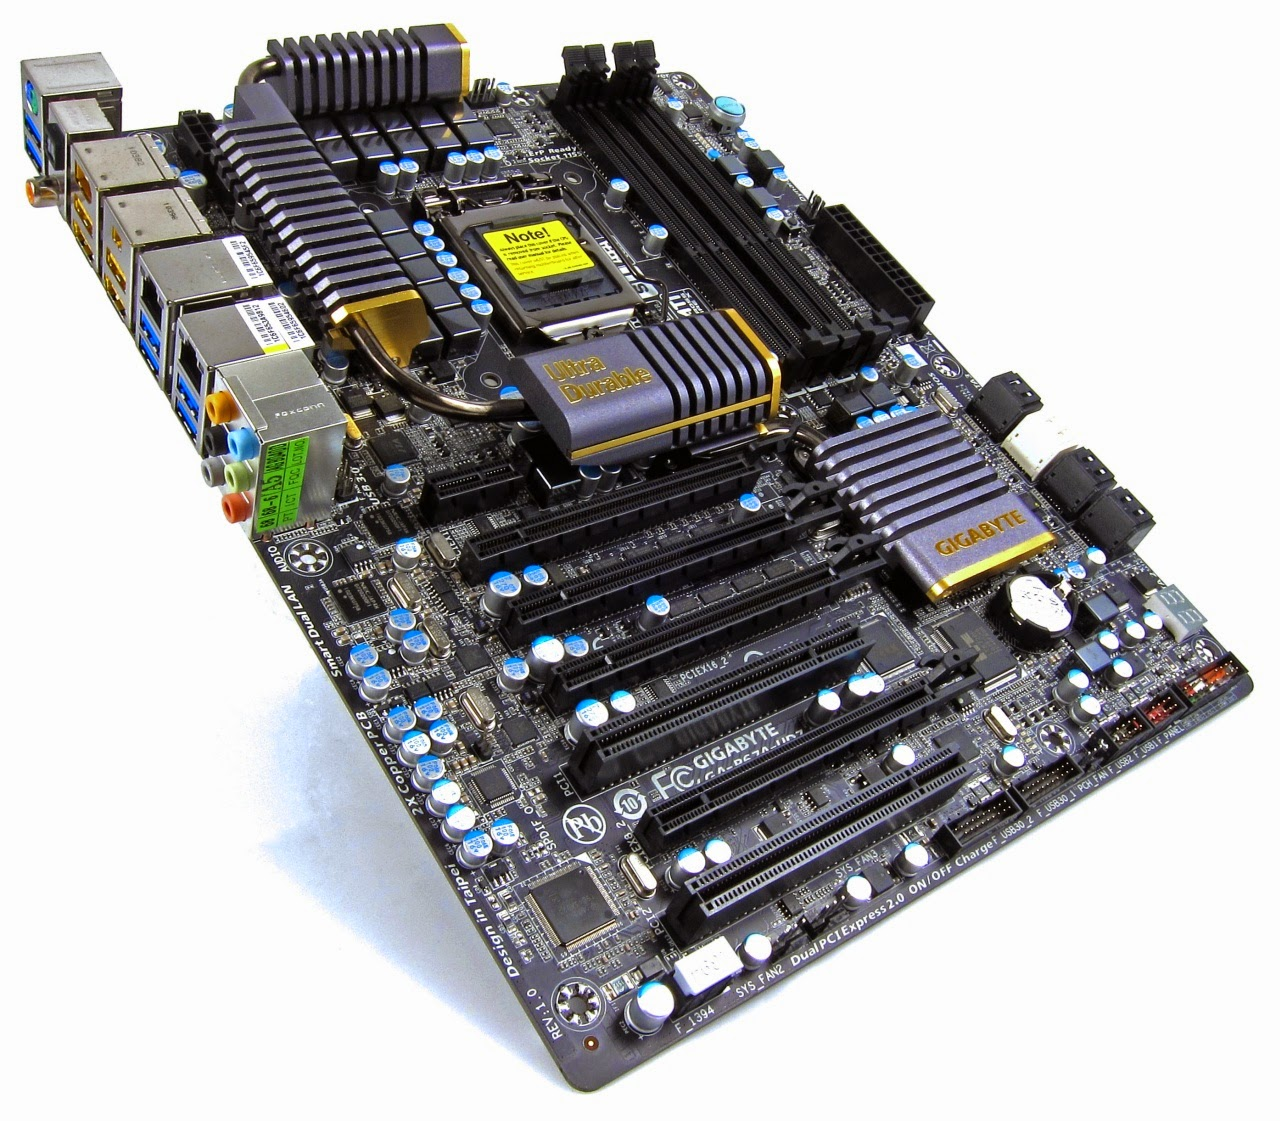 Daftar Processor Intel Socket 1150 Karmashares Llc Leveraging Core I5 2400 Tray Fan Ori 1155 Lga